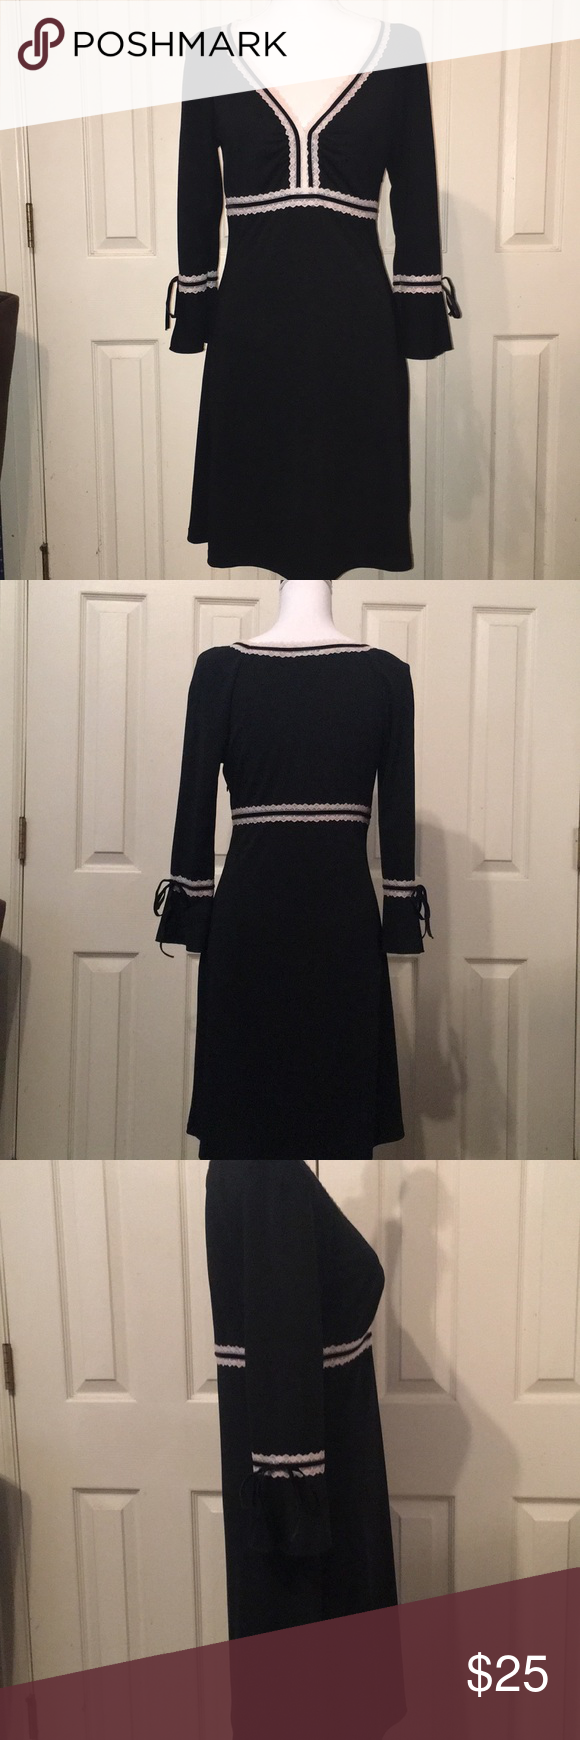 Very Pretty Moda International Dress Pretty Black Dresses Clothes Design Fashion [ 1740 x 580 Pixel ]